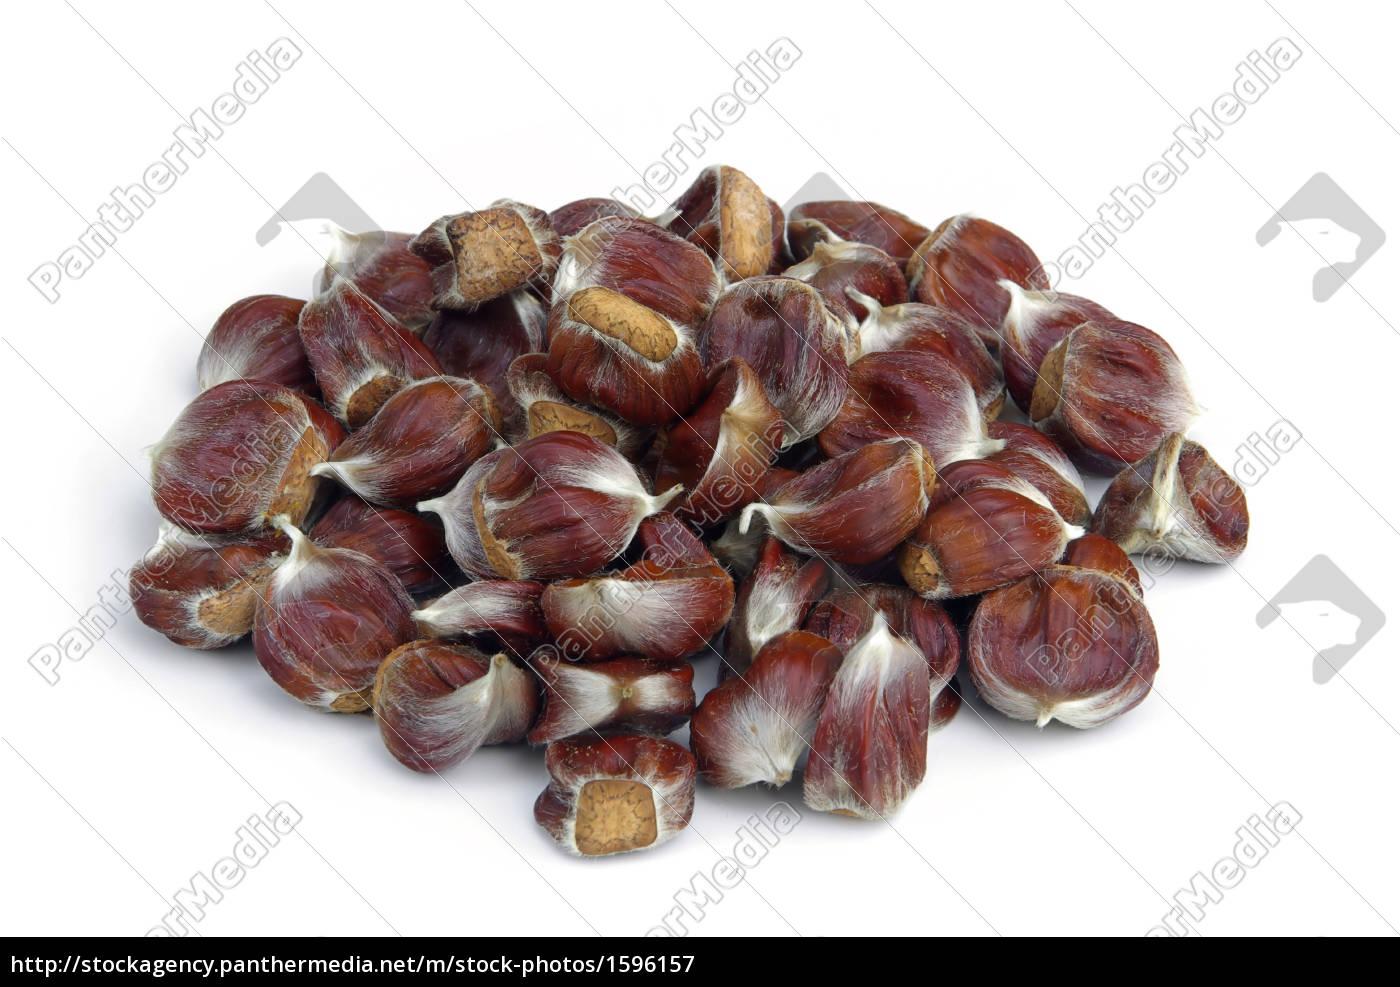 chestnut, -, sweet, chestnut, 06 - 1596157